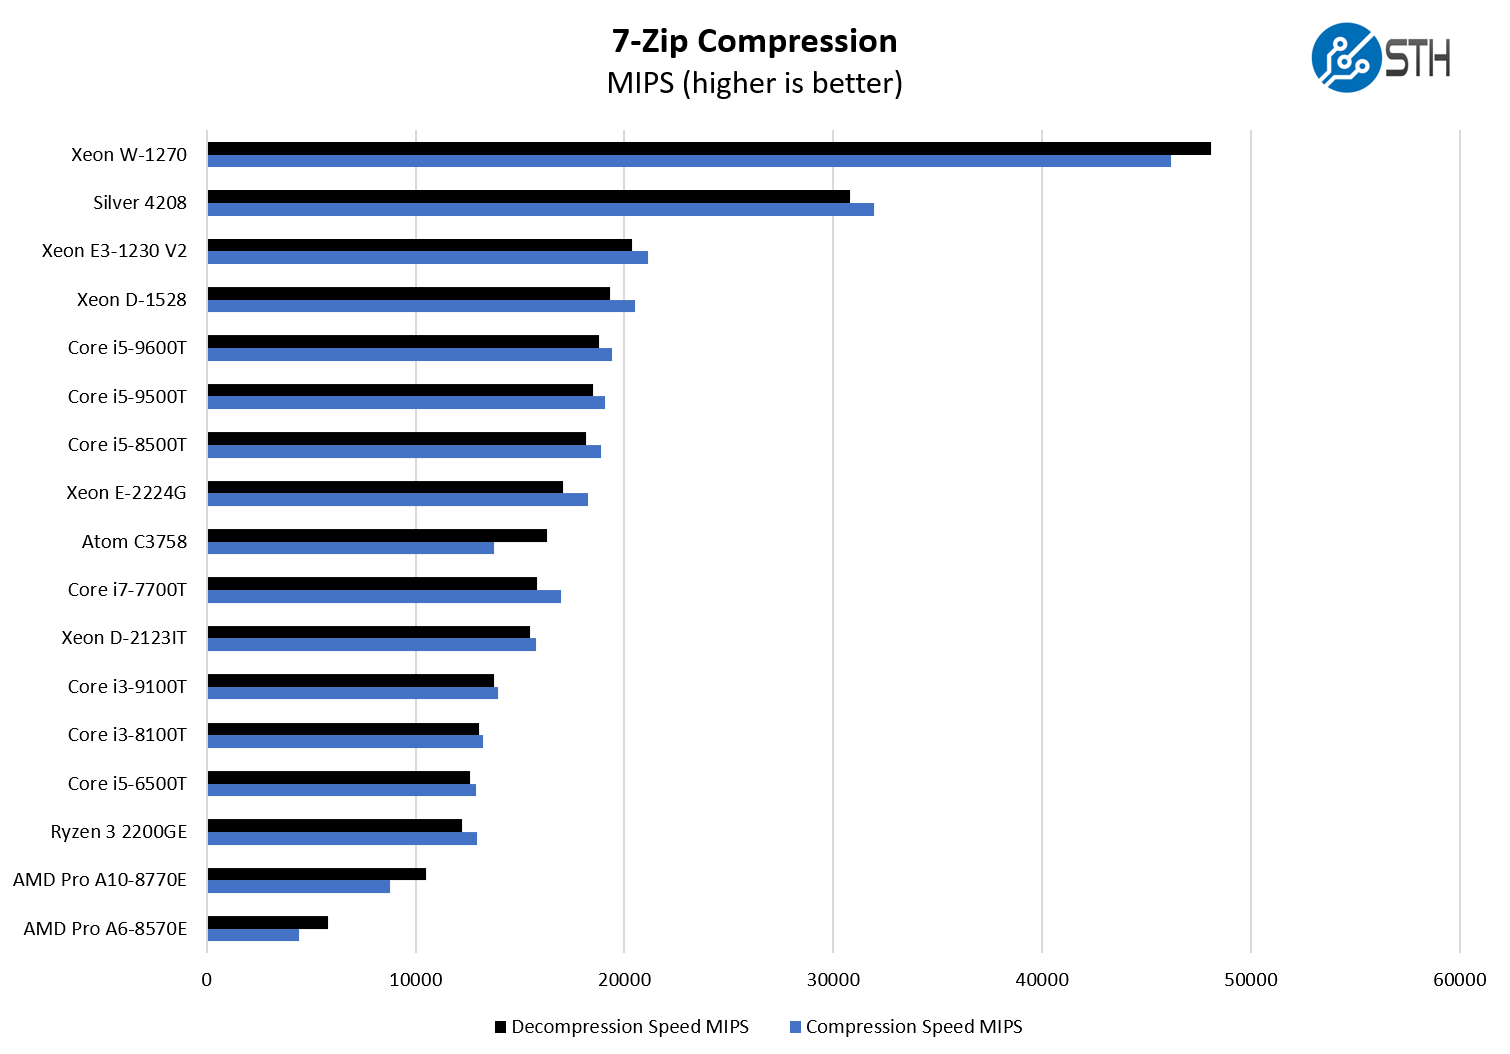 Intel Core I5 9600T 7zip Compression Benchmark